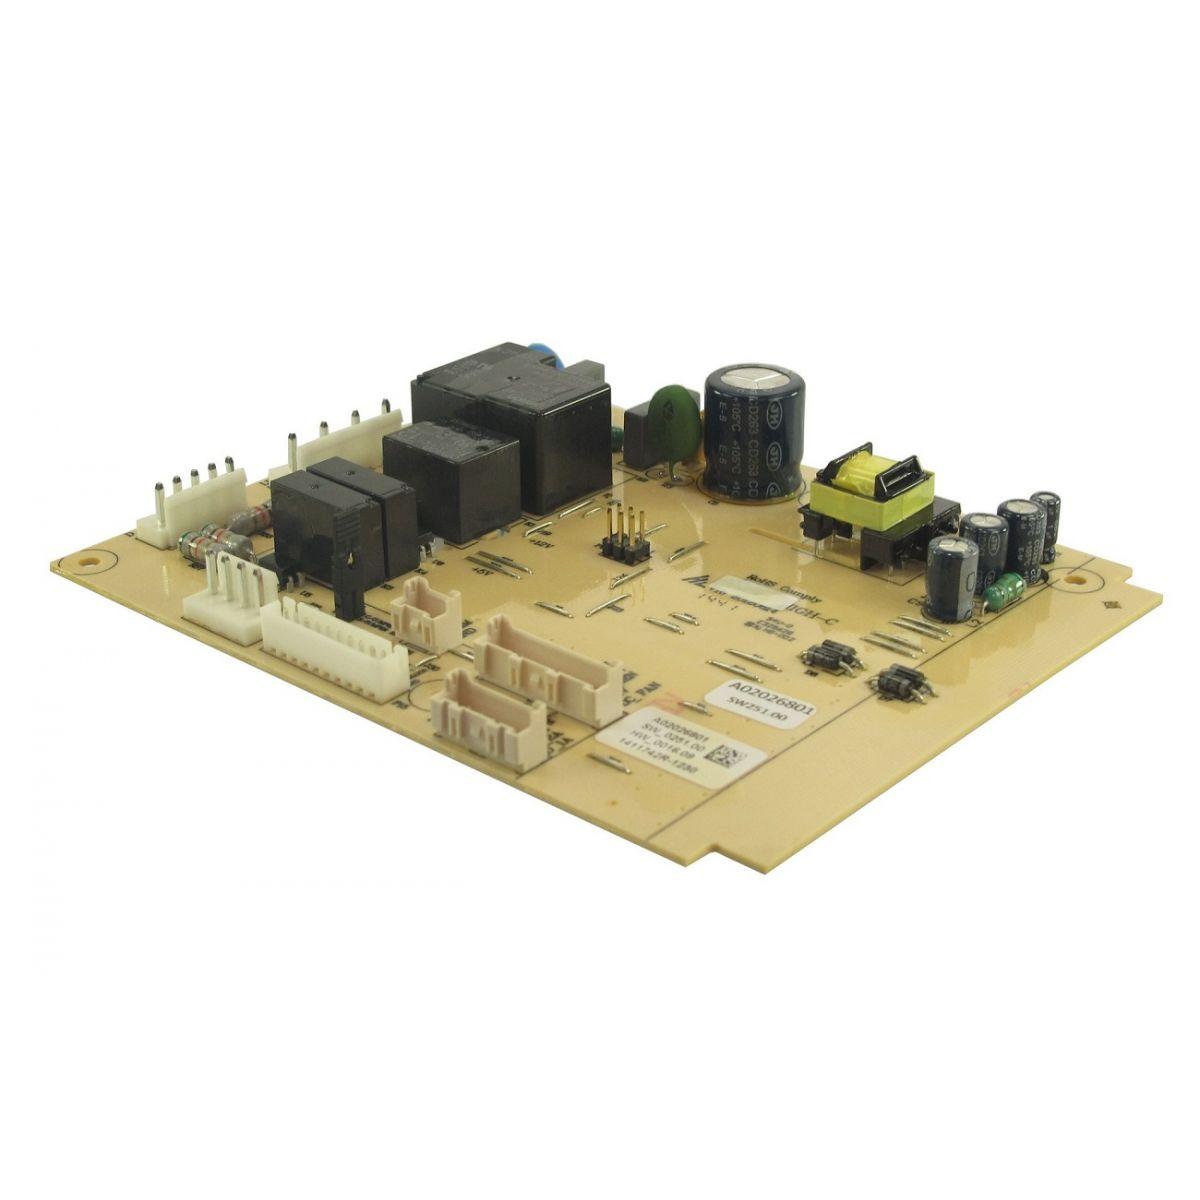 Placa De Potência Refrigerador Electrolux Di80X 64501726